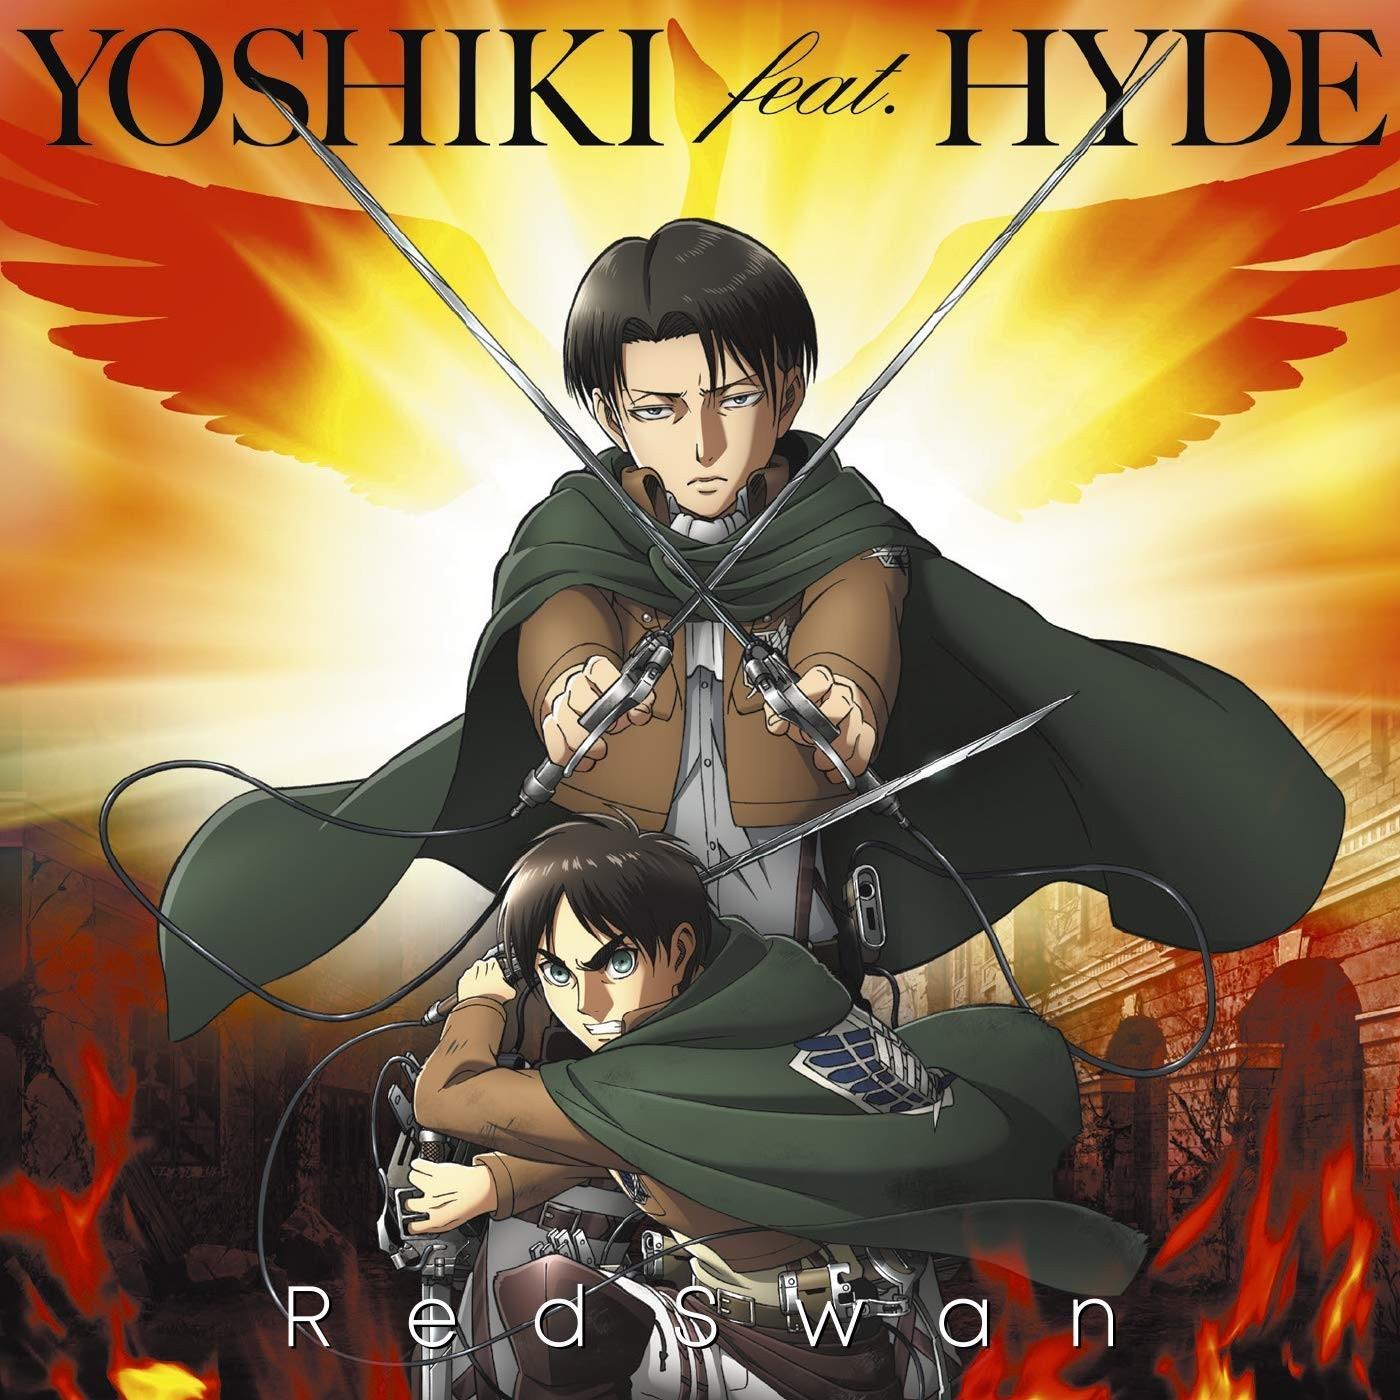 YOSHIKI feat. HYDE – Red Swan [FLAC + MP3 320 / CD] [2018.10.03]